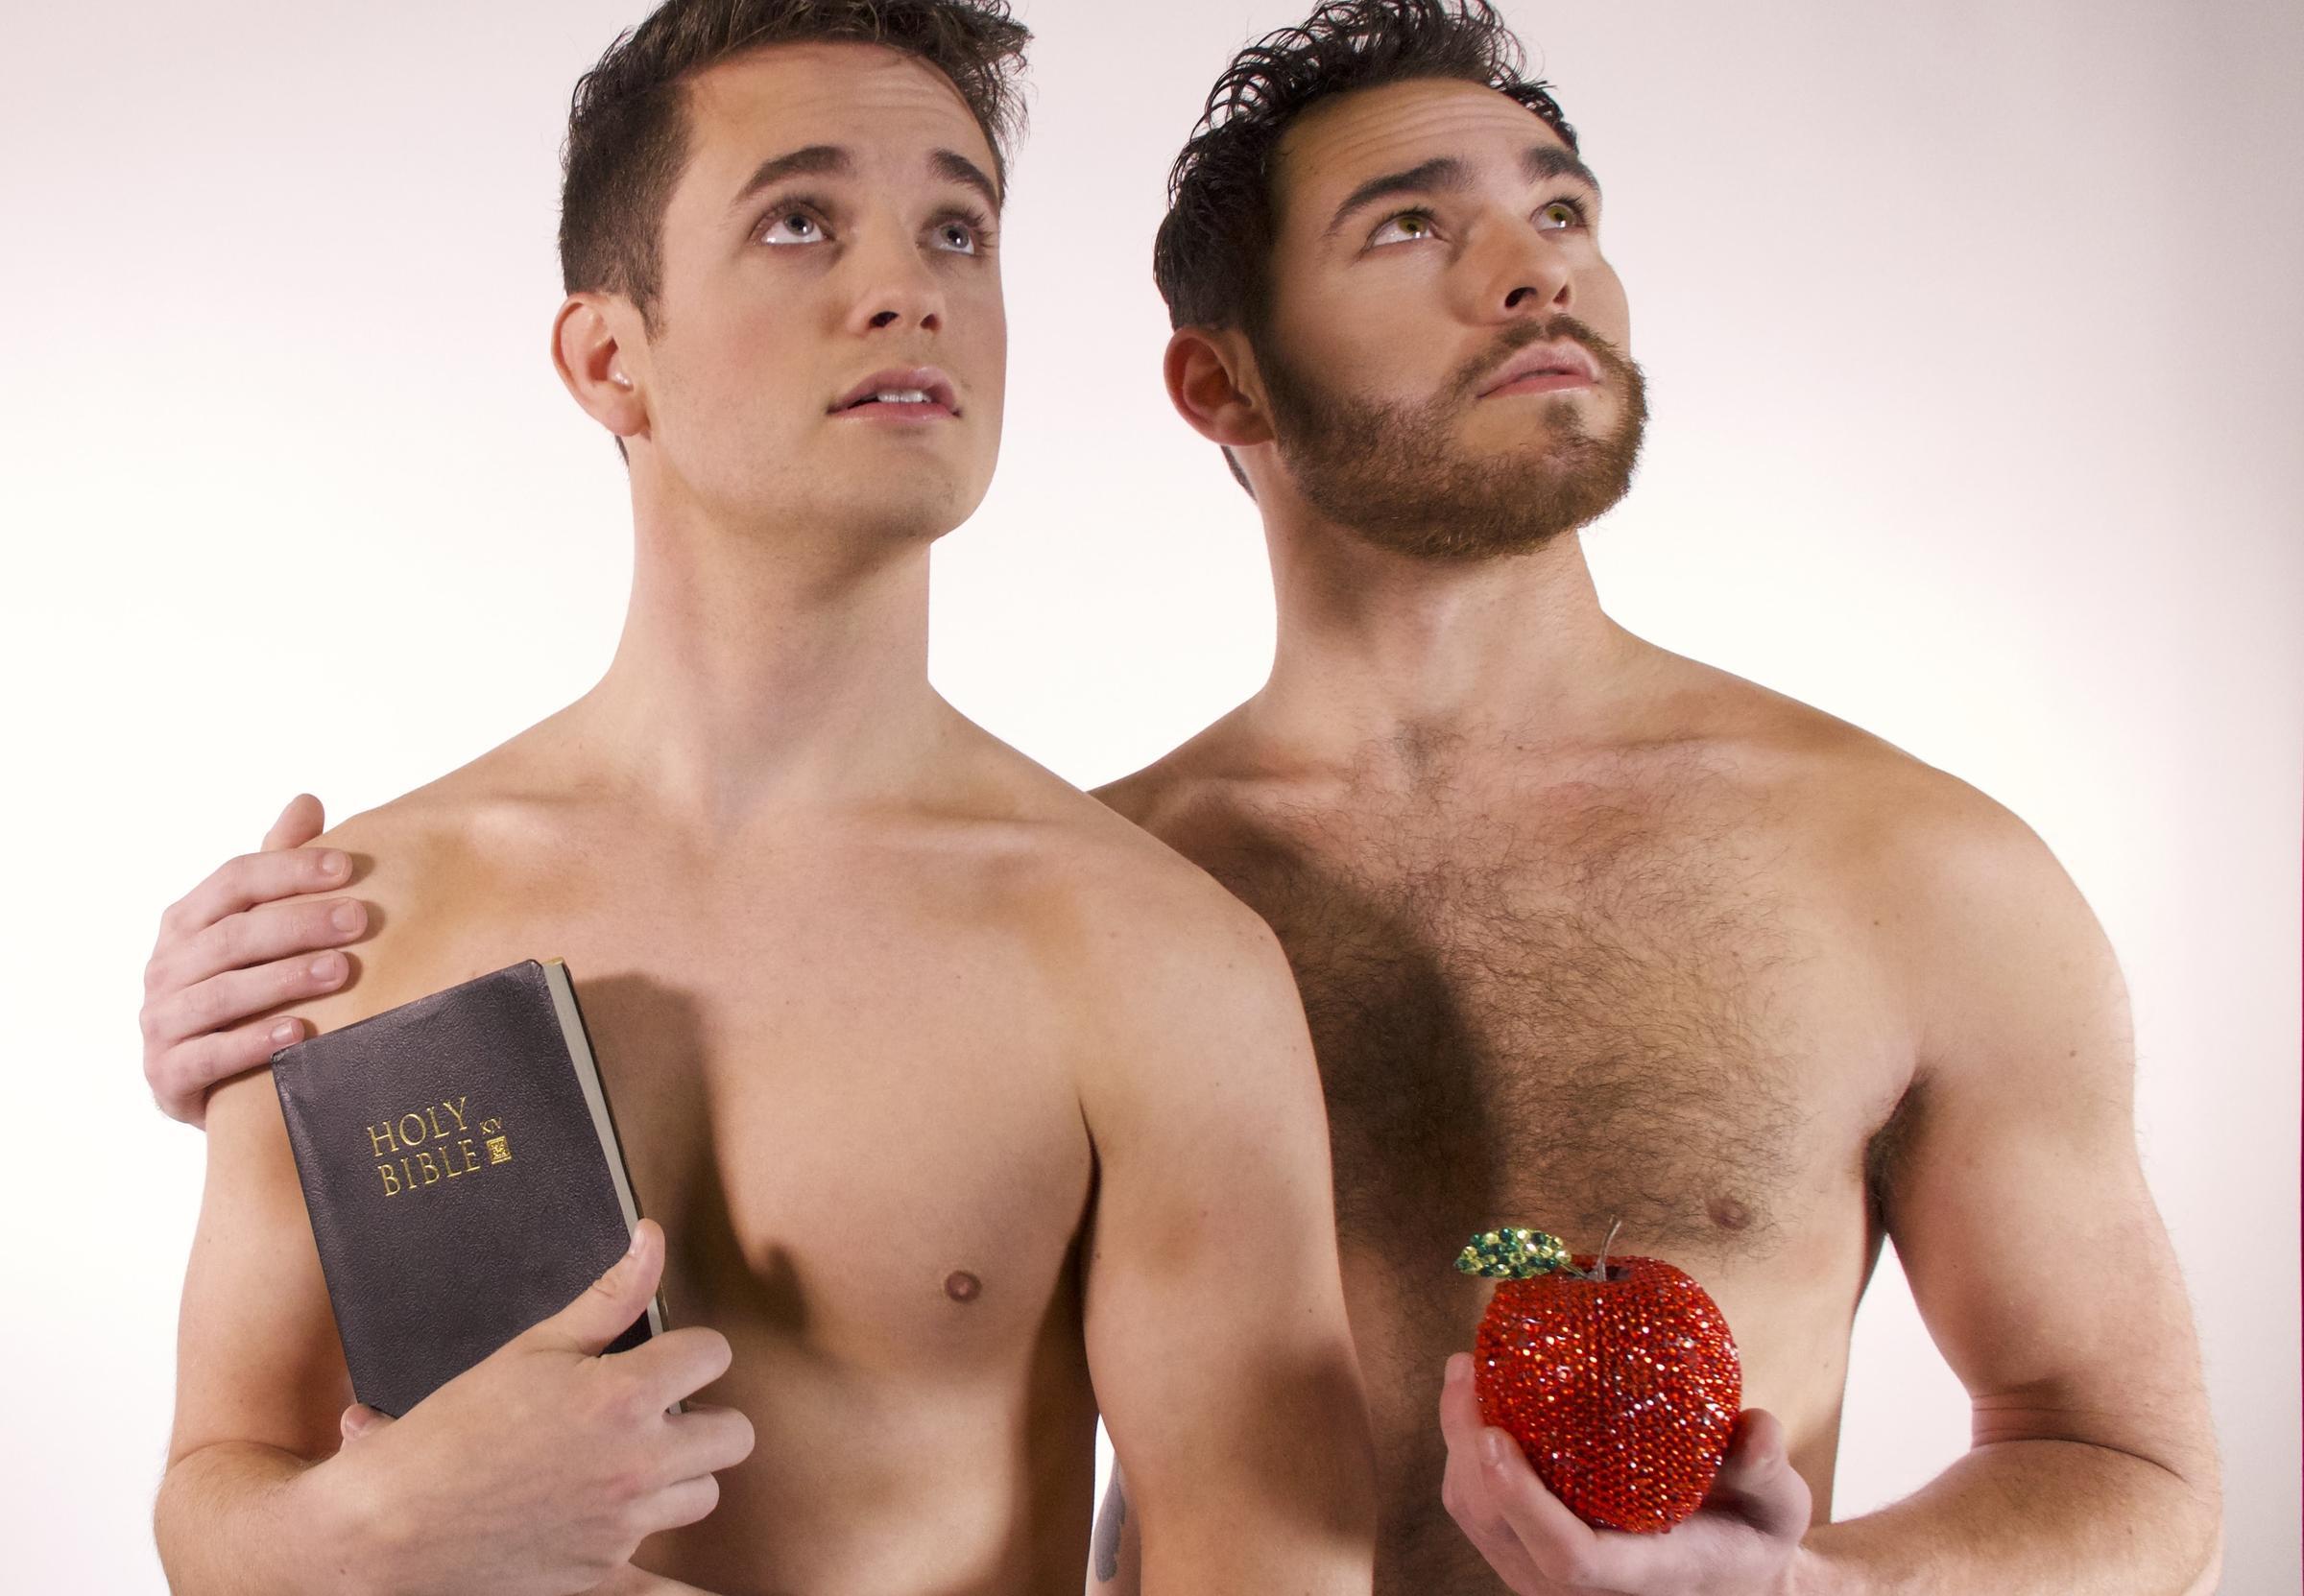 grupo gay historia